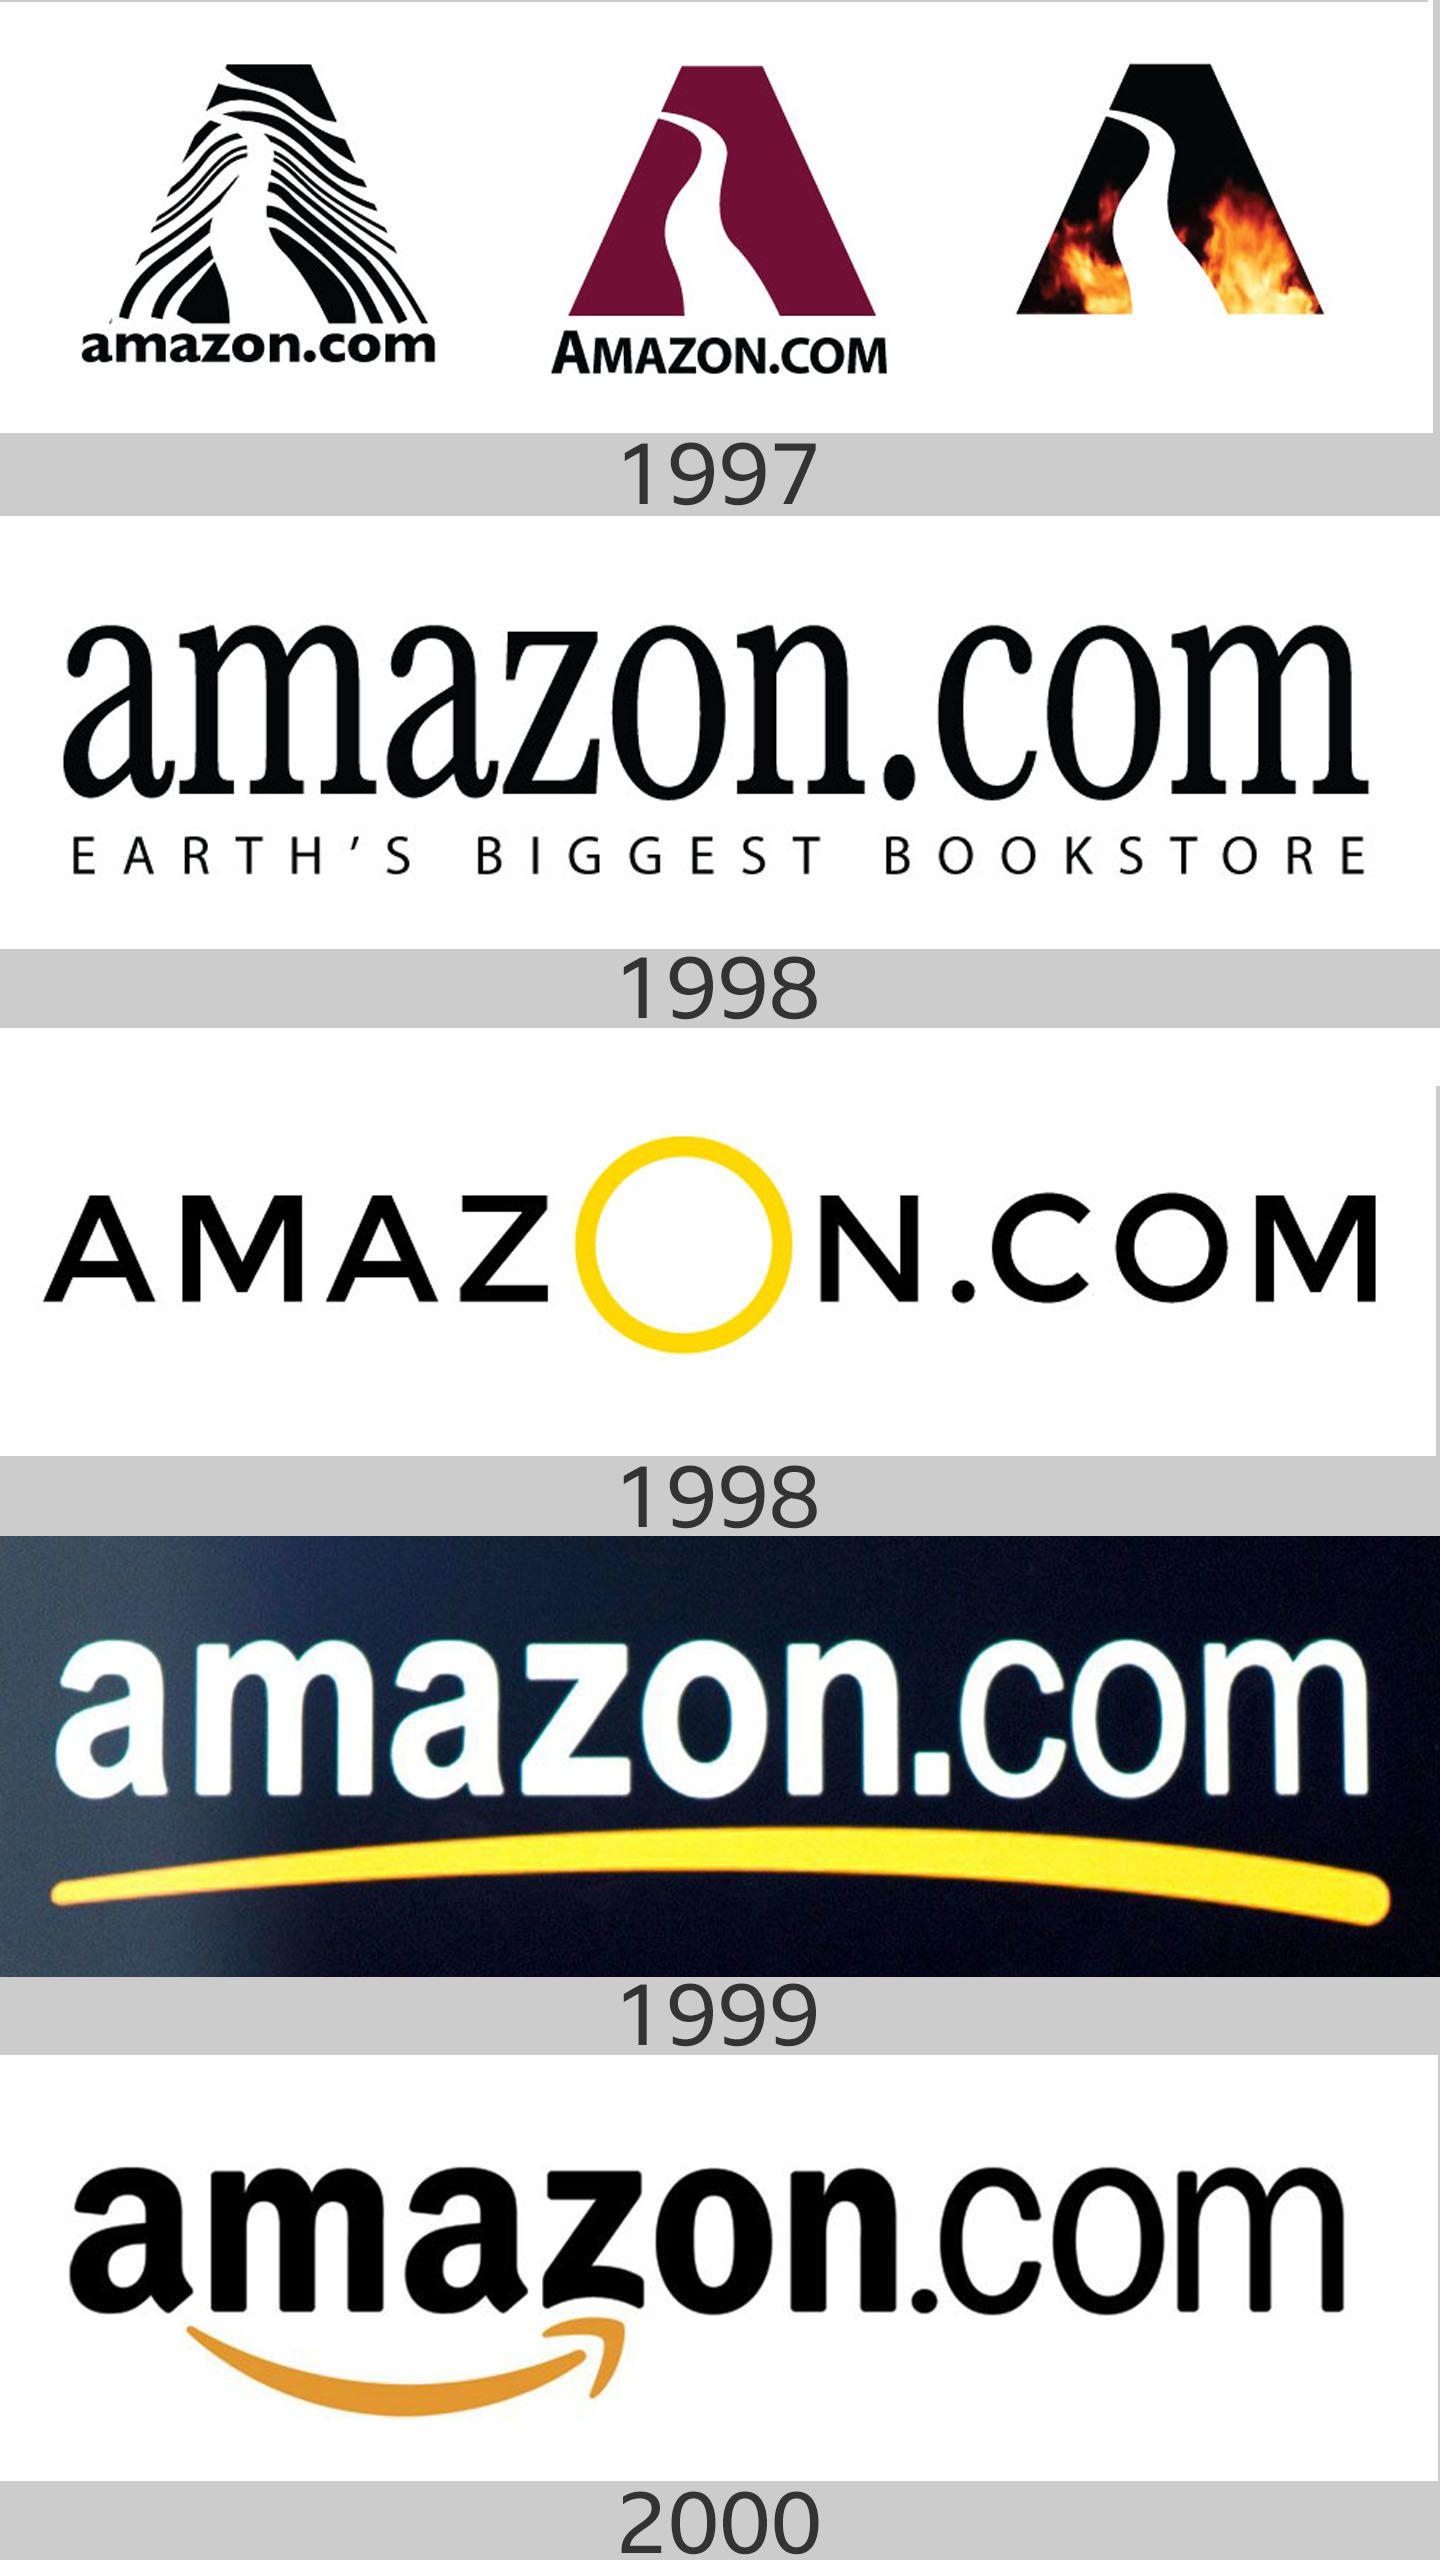 Evolucion del Logotipo de Amazon.com